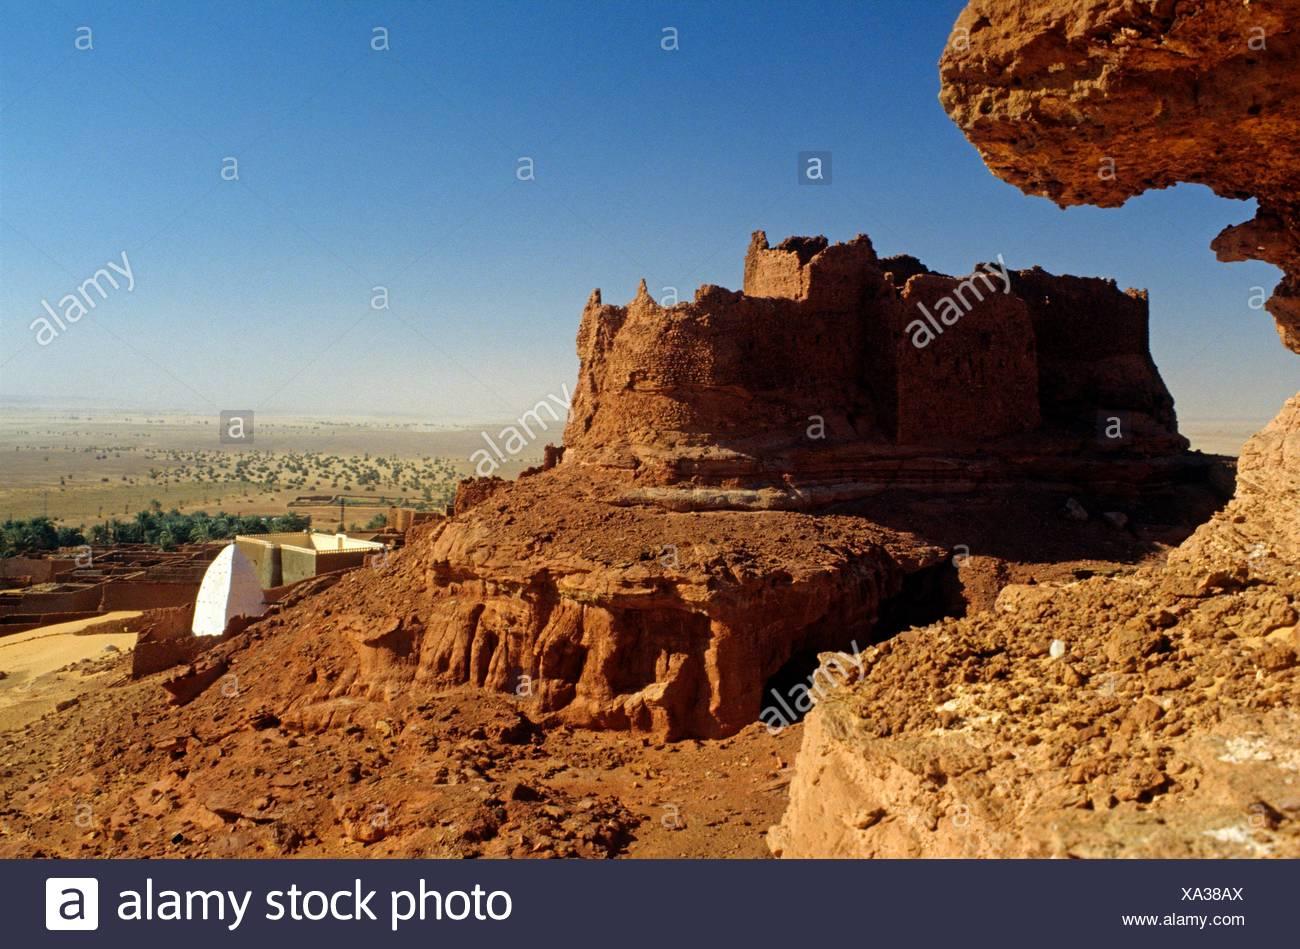 ruins of a ´´Ksar´´ overlooking the immense Tademait plateau, Timimoun, region of Gourara, Sahara, Algeria, Africa. - Stock Image